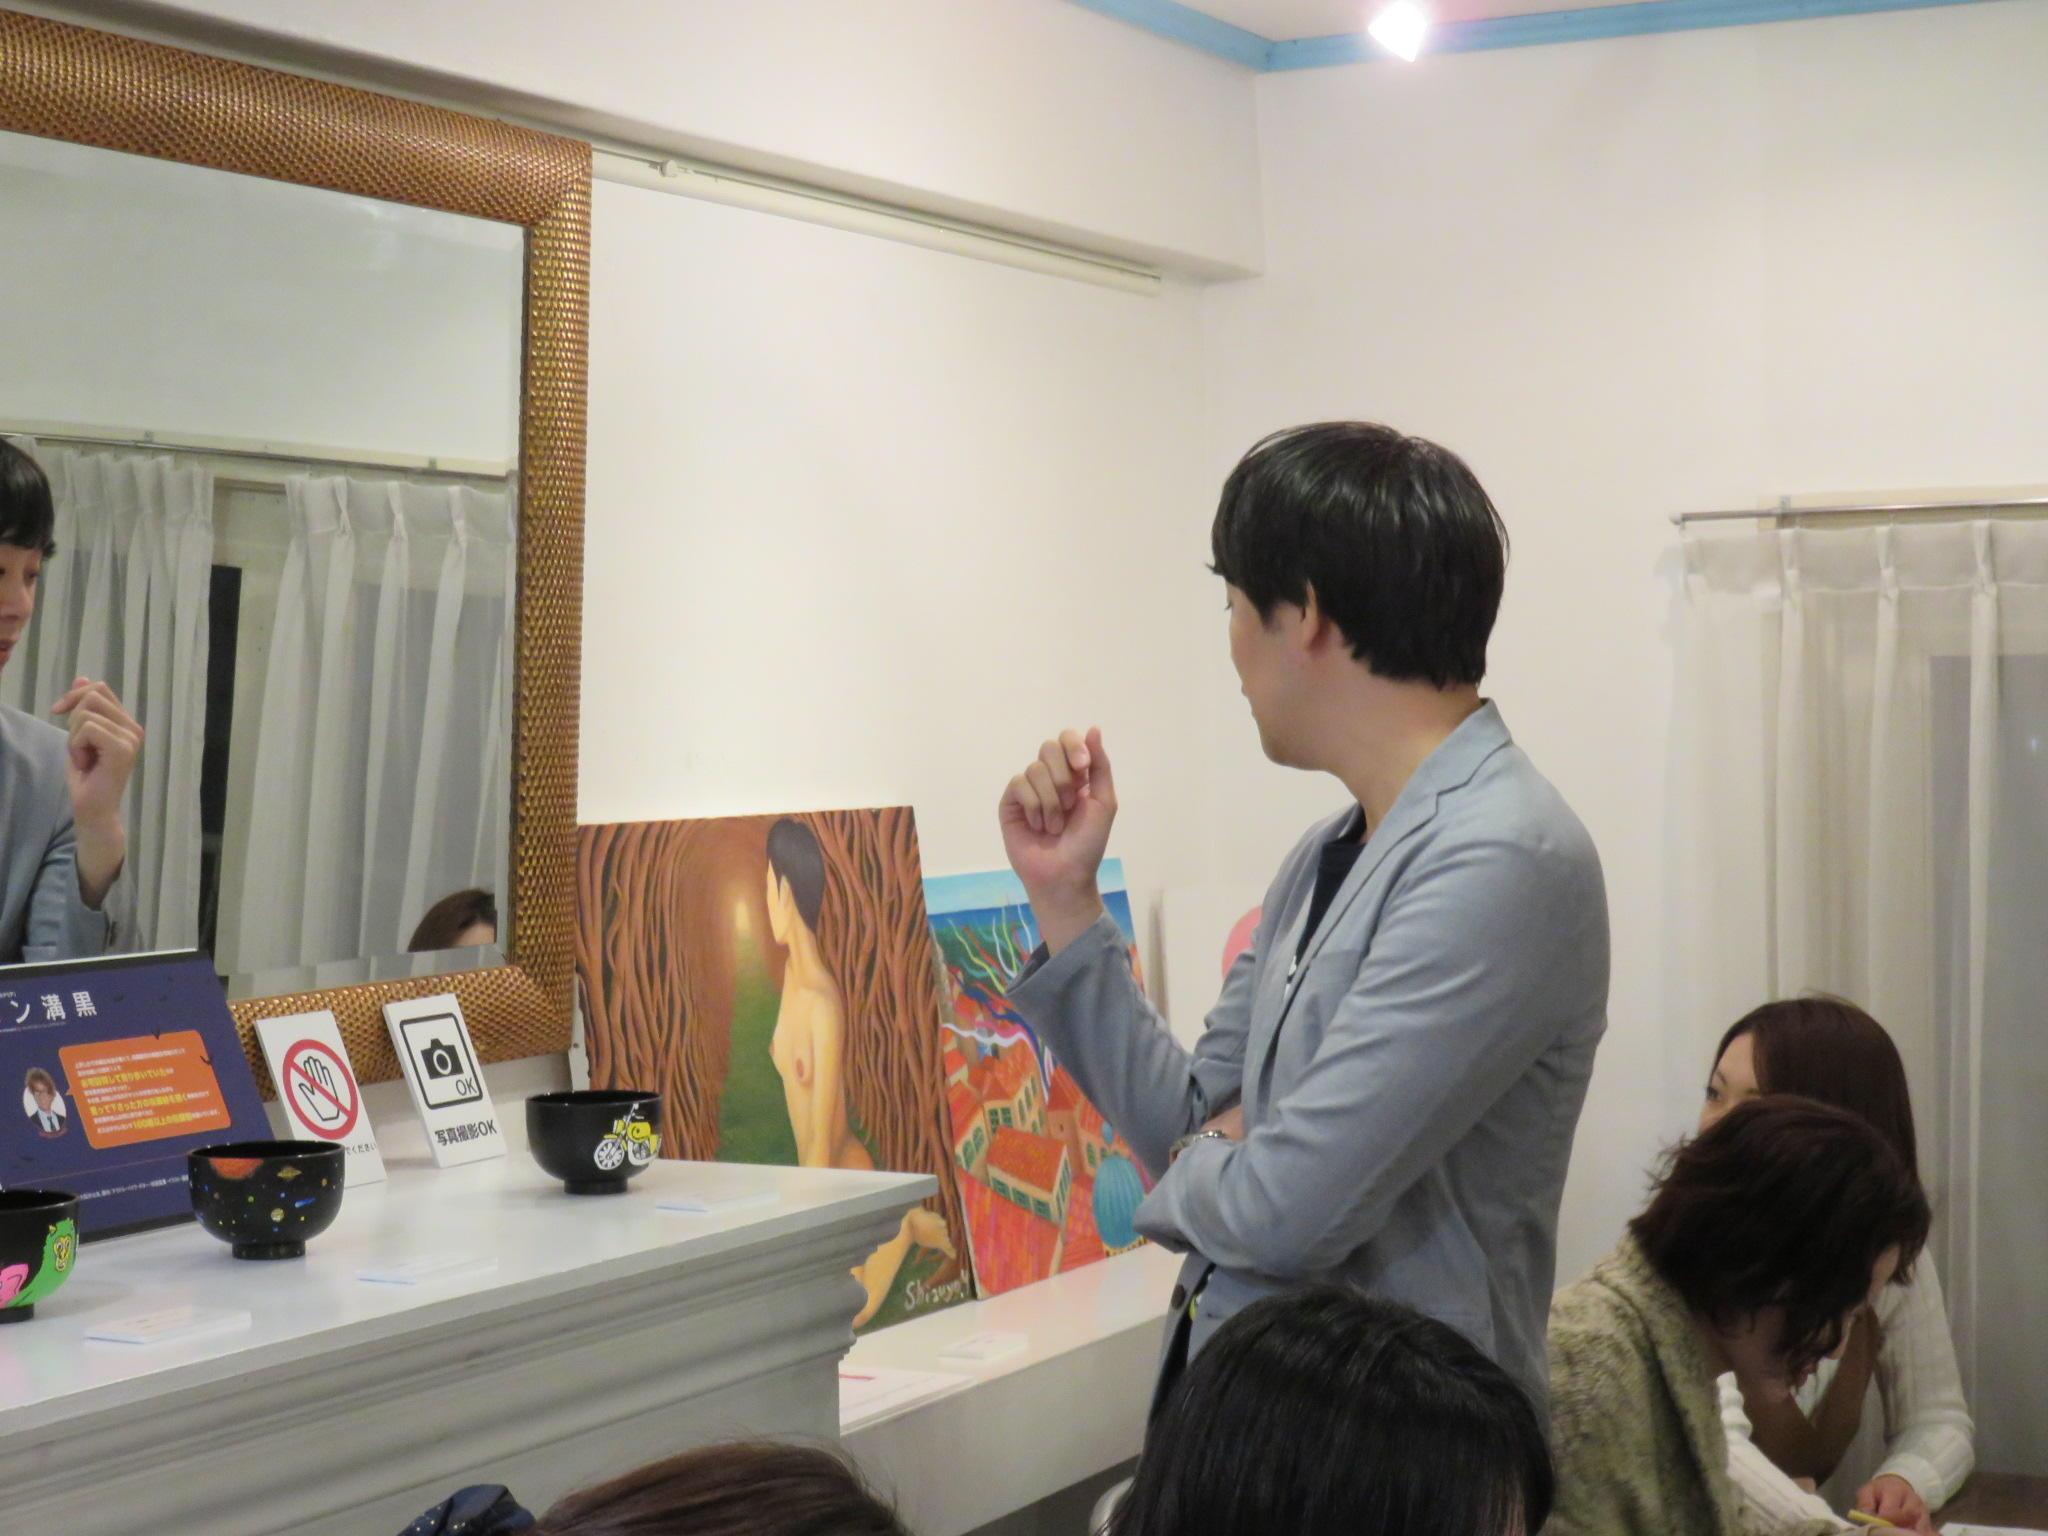 http://news.yoshimoto.co.jp/20170320205959-5b5587feafb13feb03a5fcccb868ce93b460118a.jpg